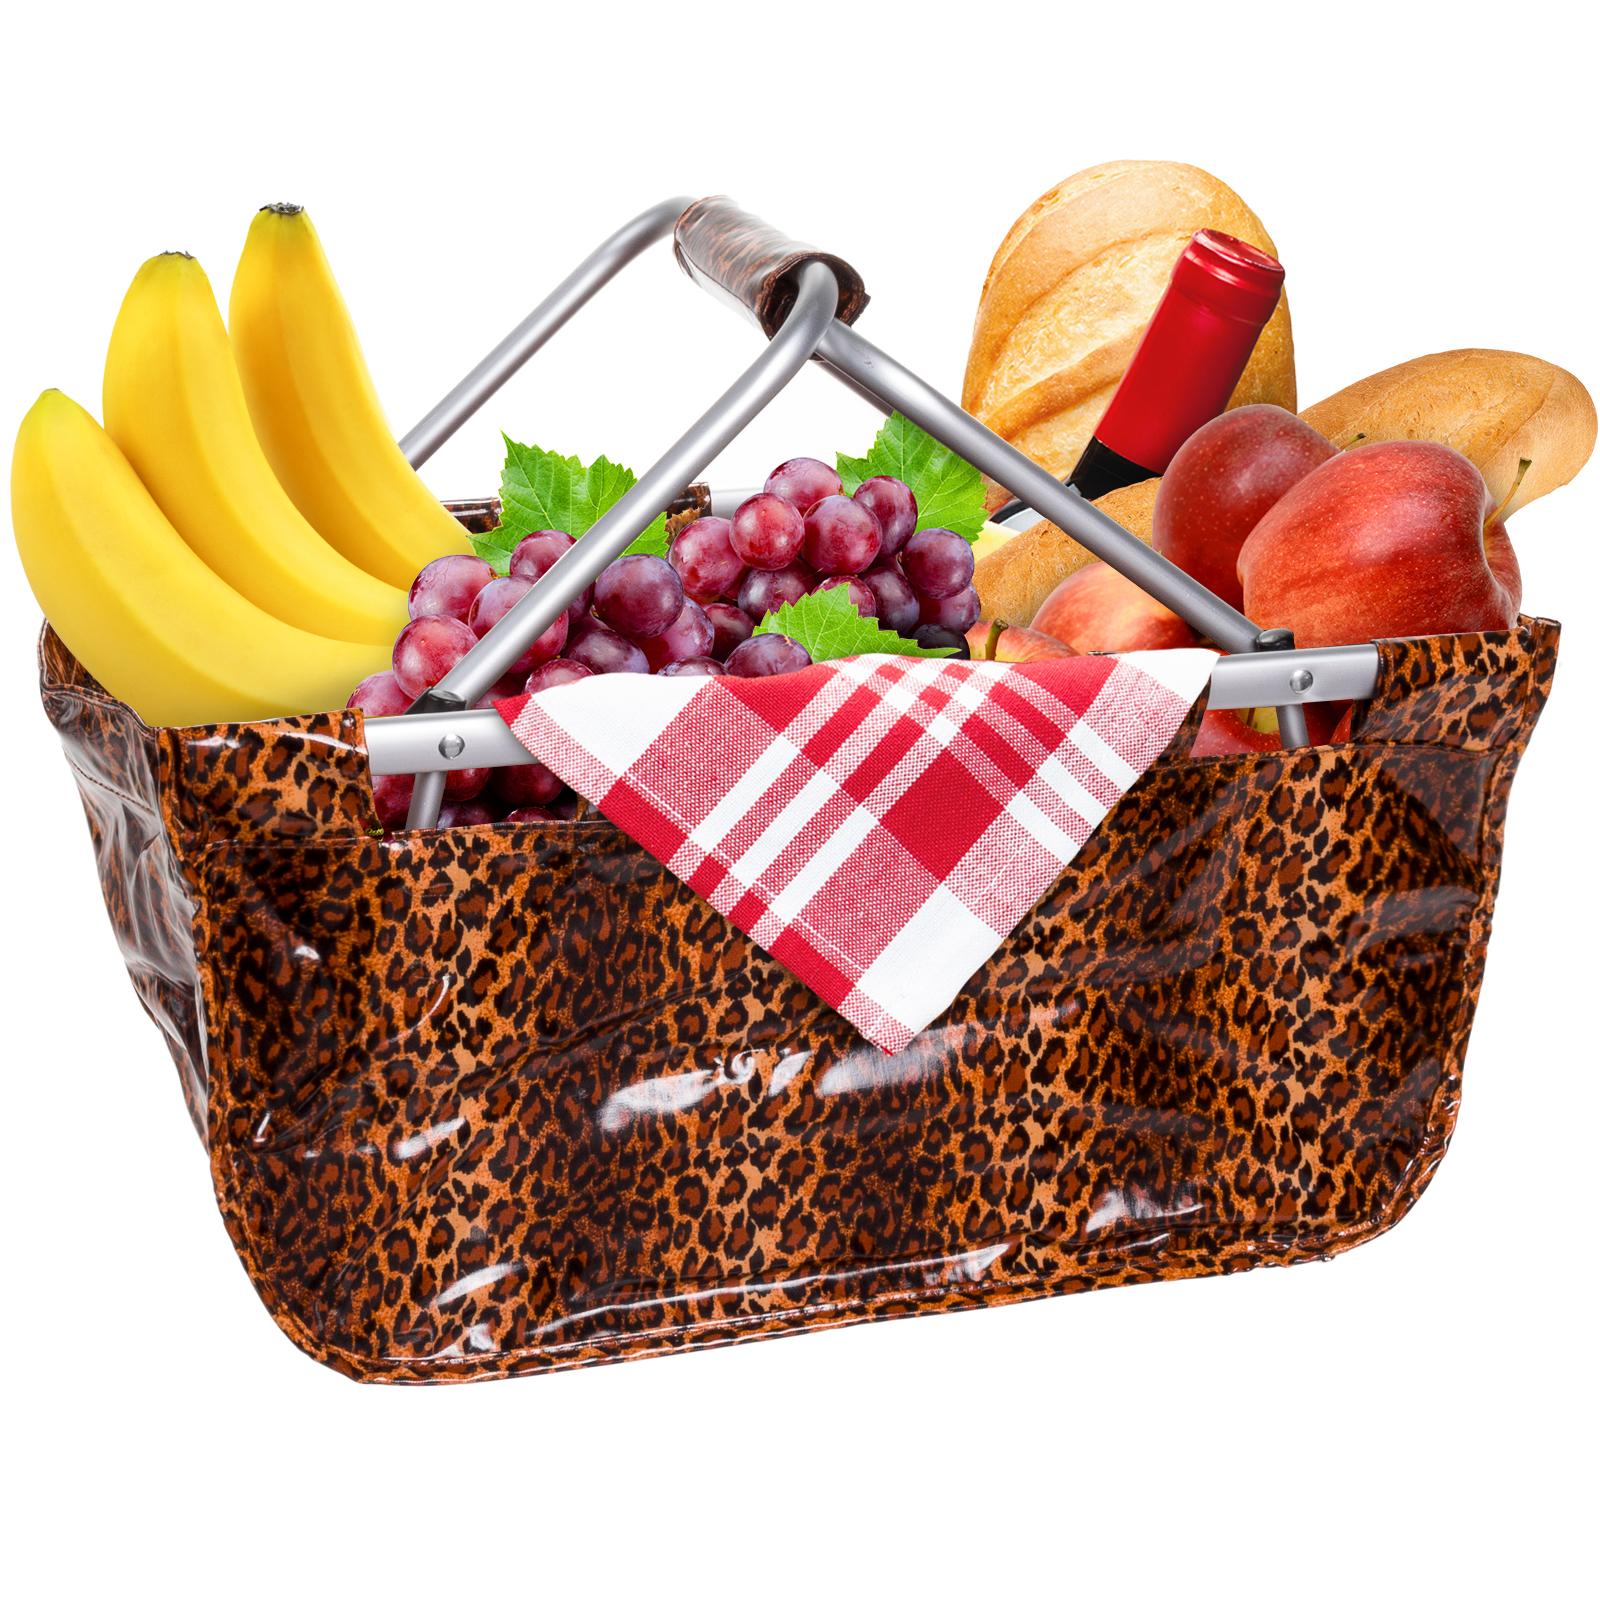 Picnic Basket Food : Print collapsible picnic basket park foldable camping food